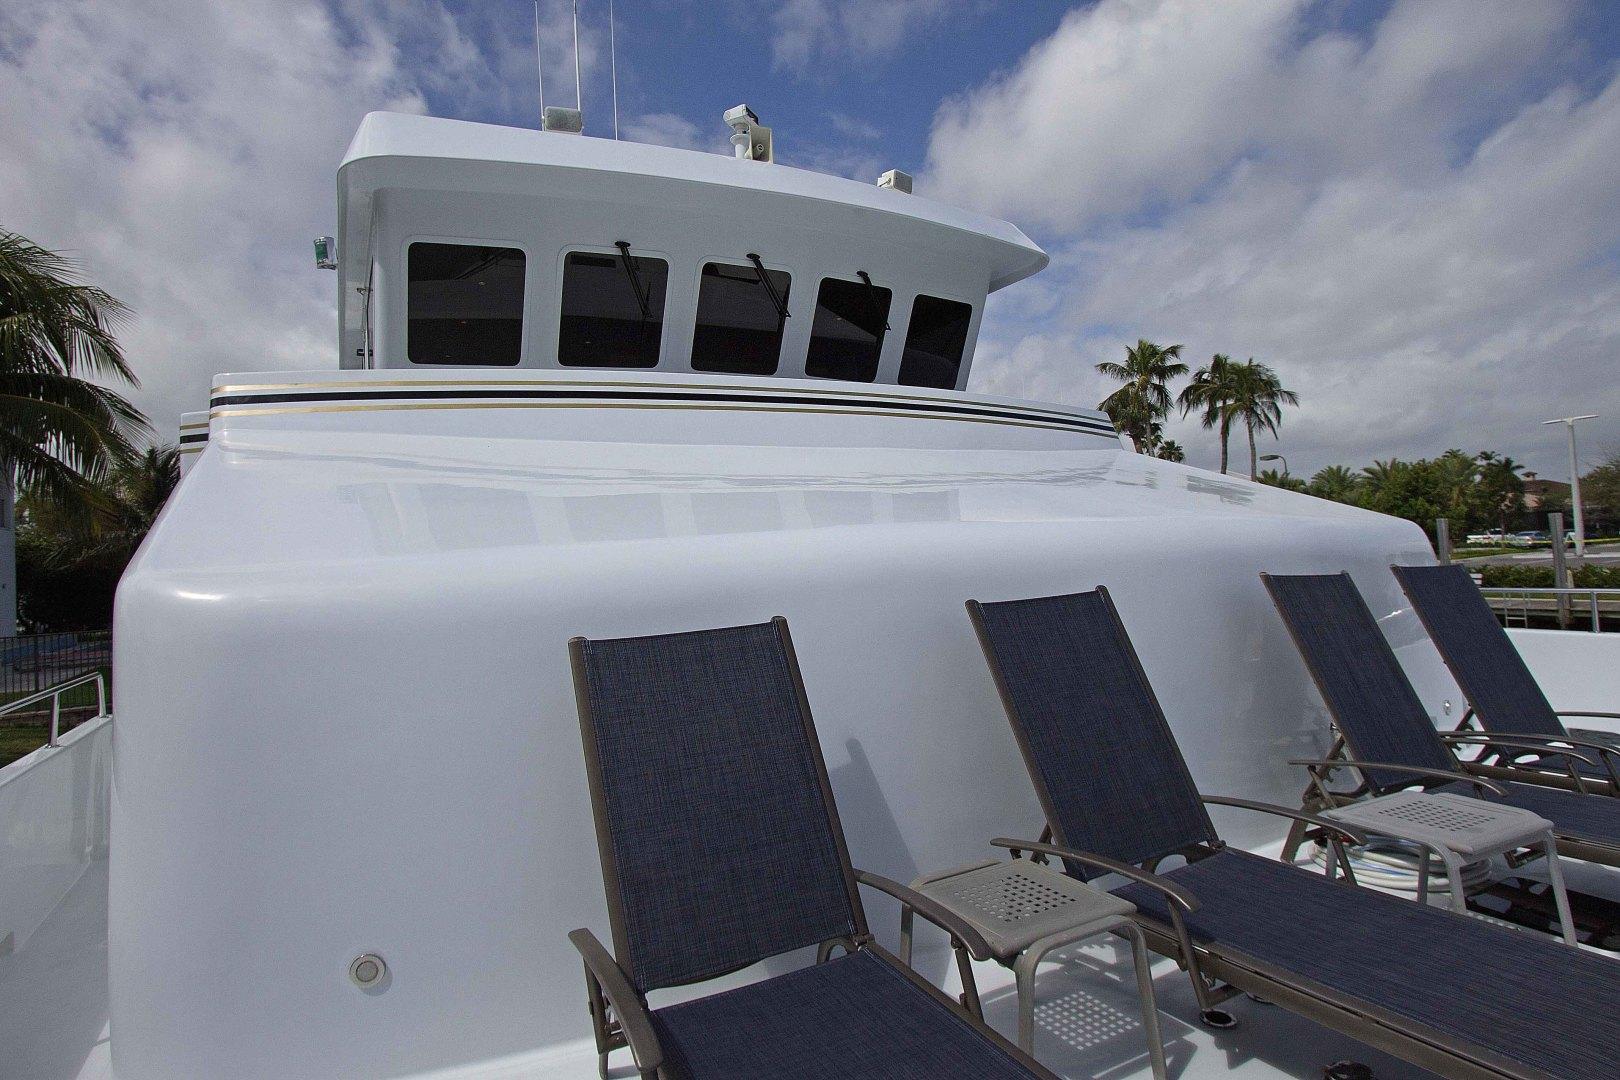 Theriault & Son-Custom Catamaran 2000-Slumber Venture Fort Lauderdale-Florida-United States-1625420 | Thumbnail